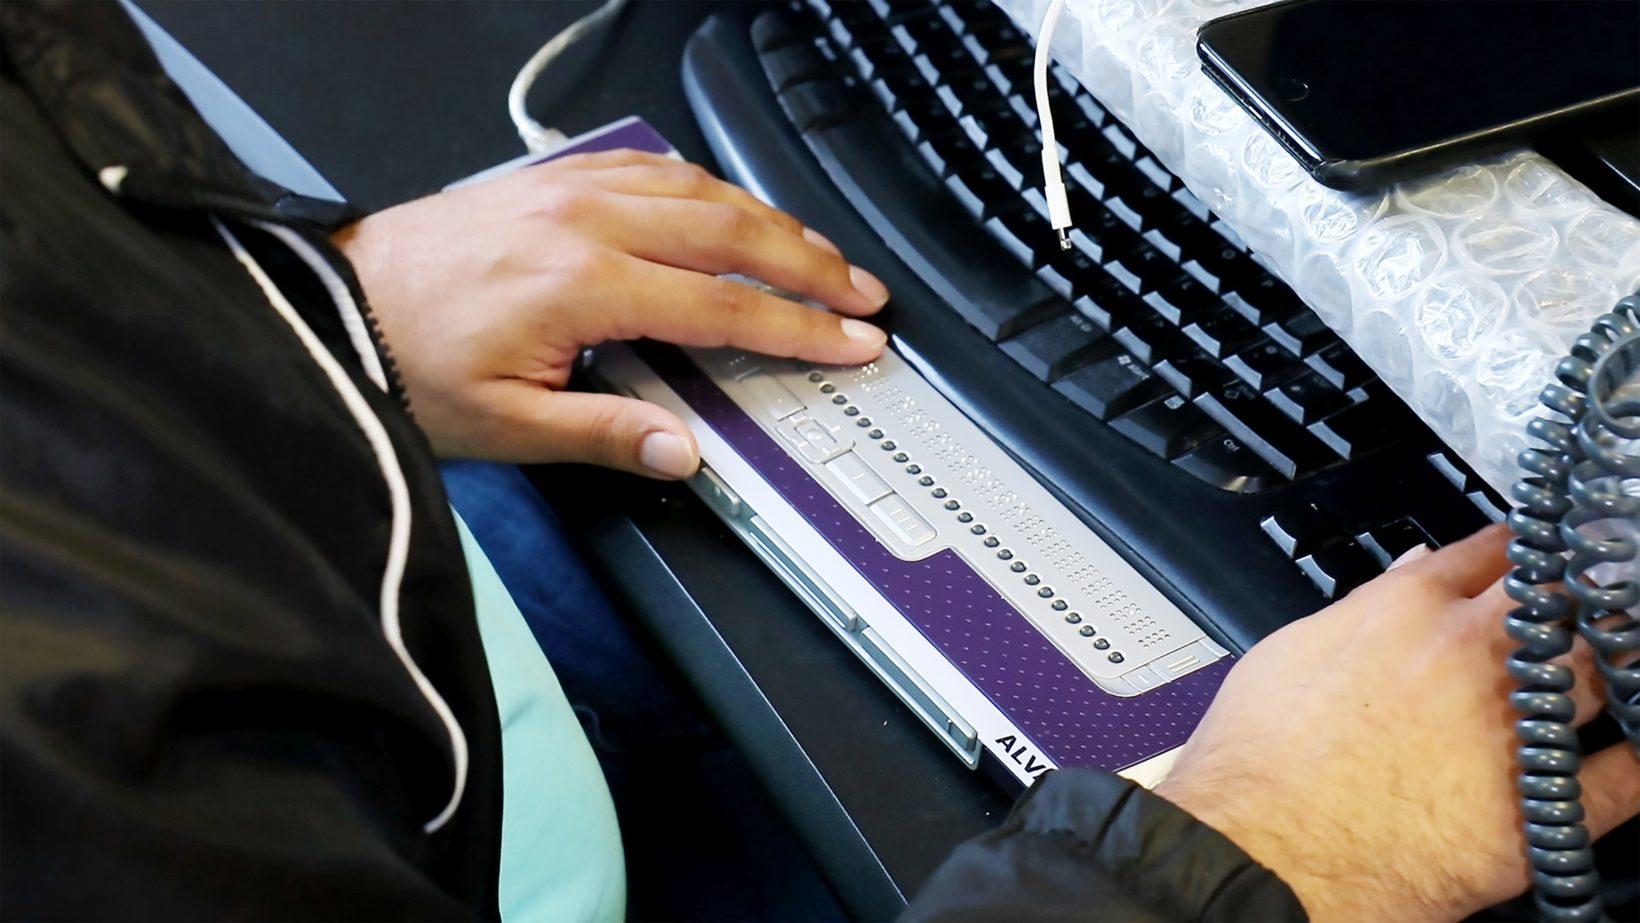 USB per schermi braille